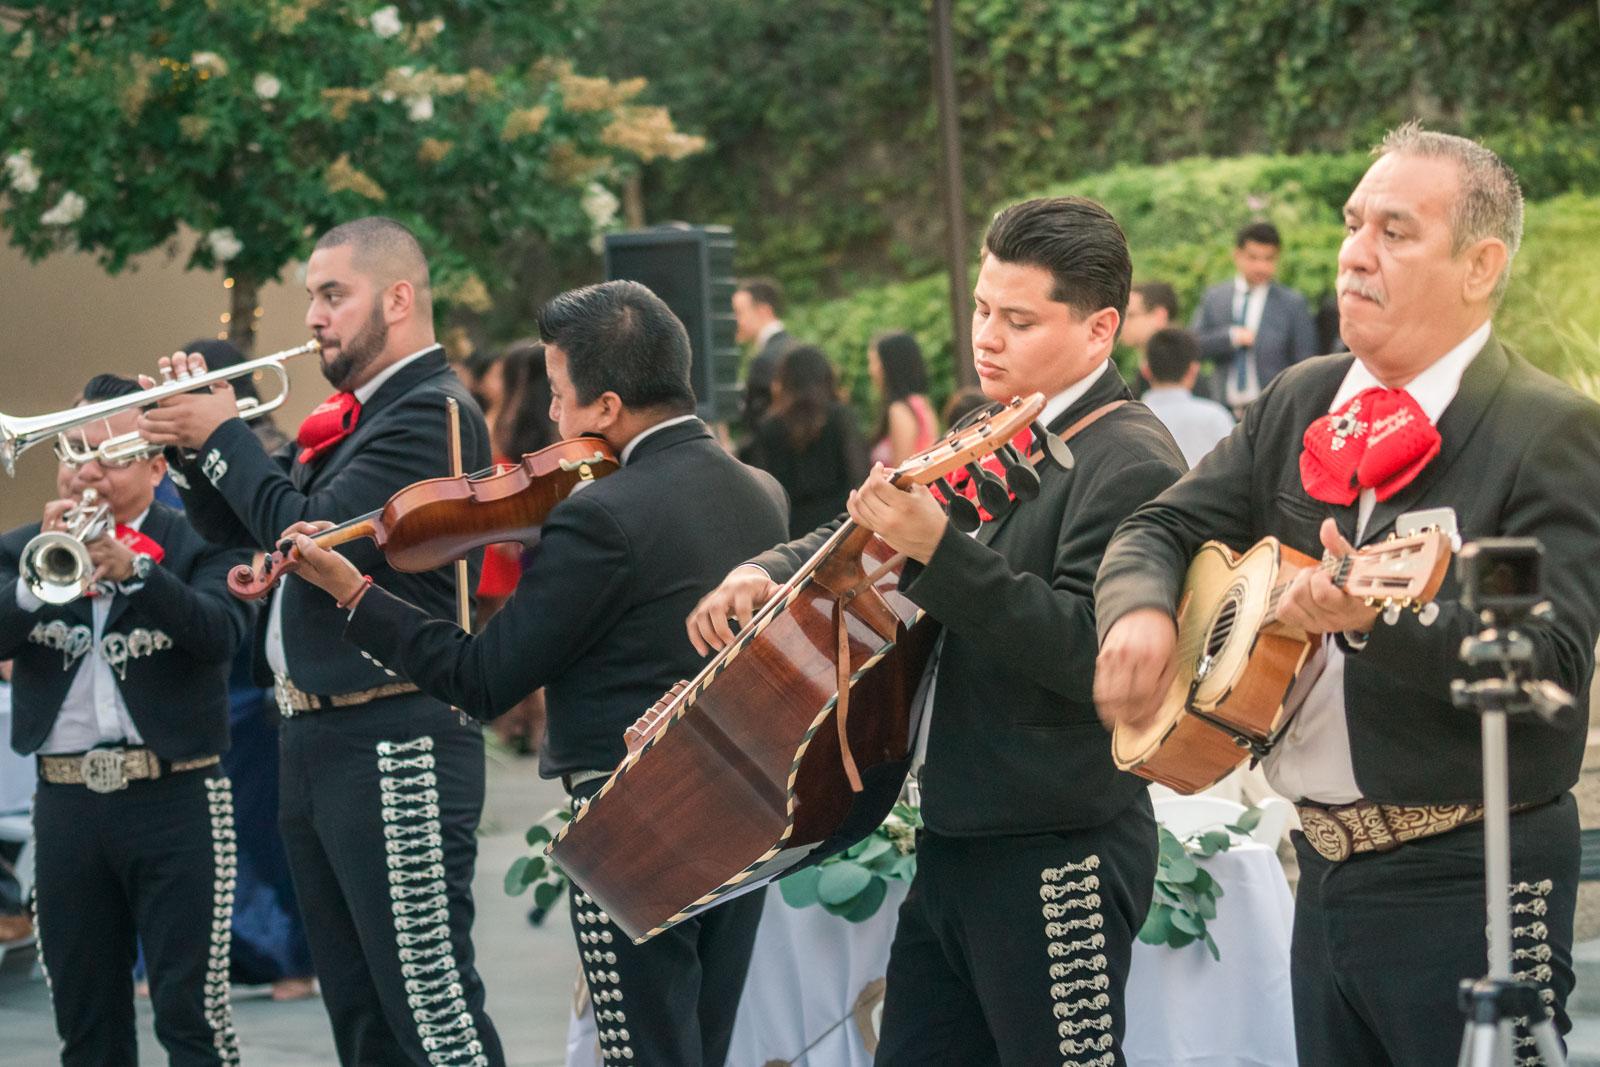 364_Angel-Brea-Orange-County_Joseph-Barber-Wedding-Photography.jpg